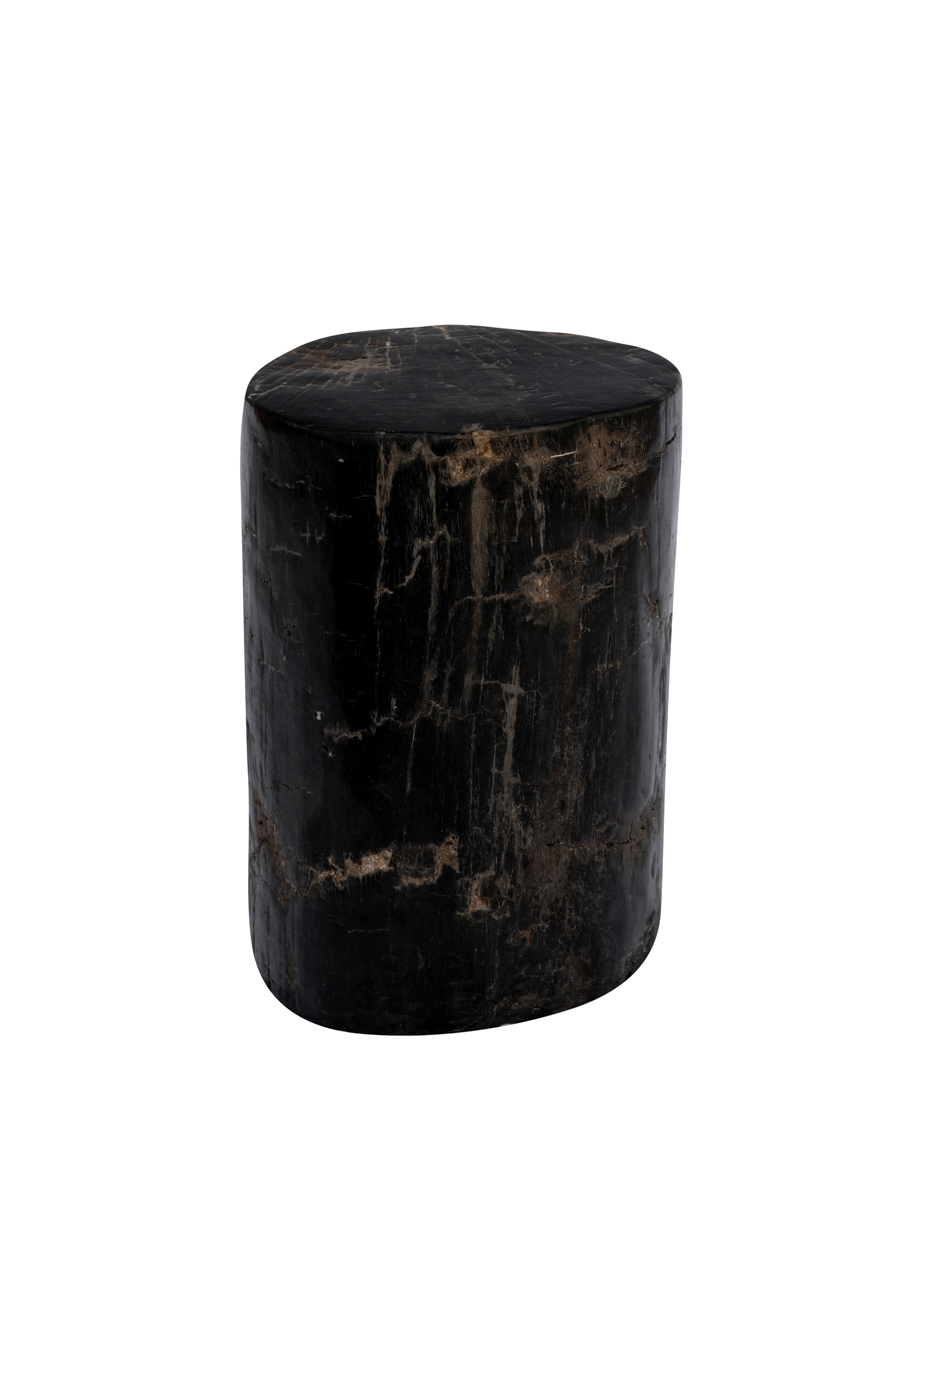 Black fossilized wood log